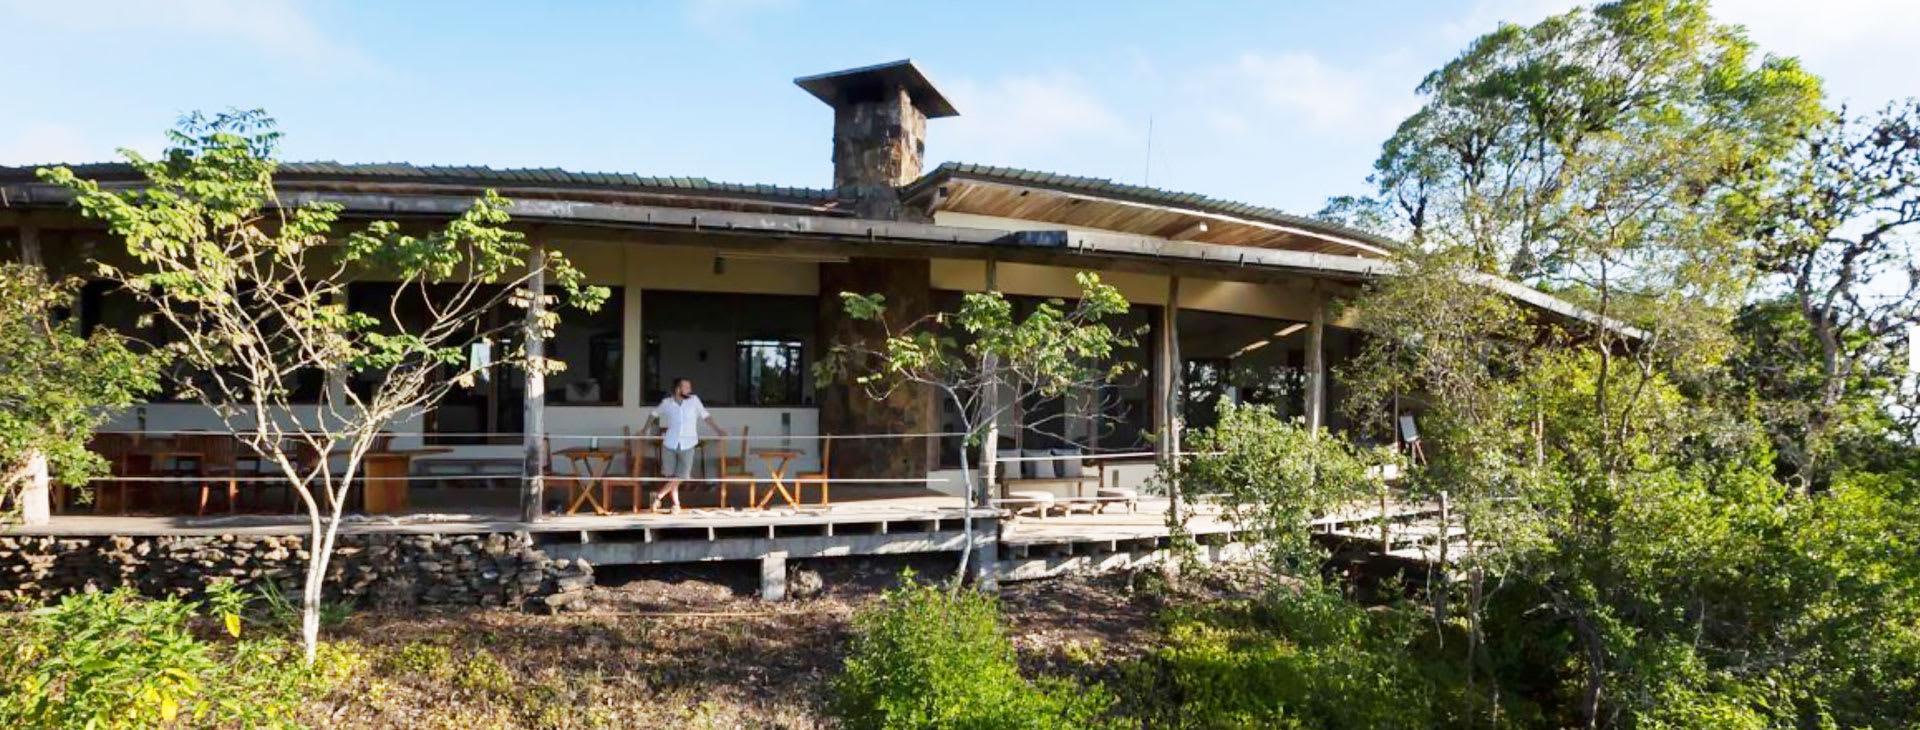 Safari Camp terrace